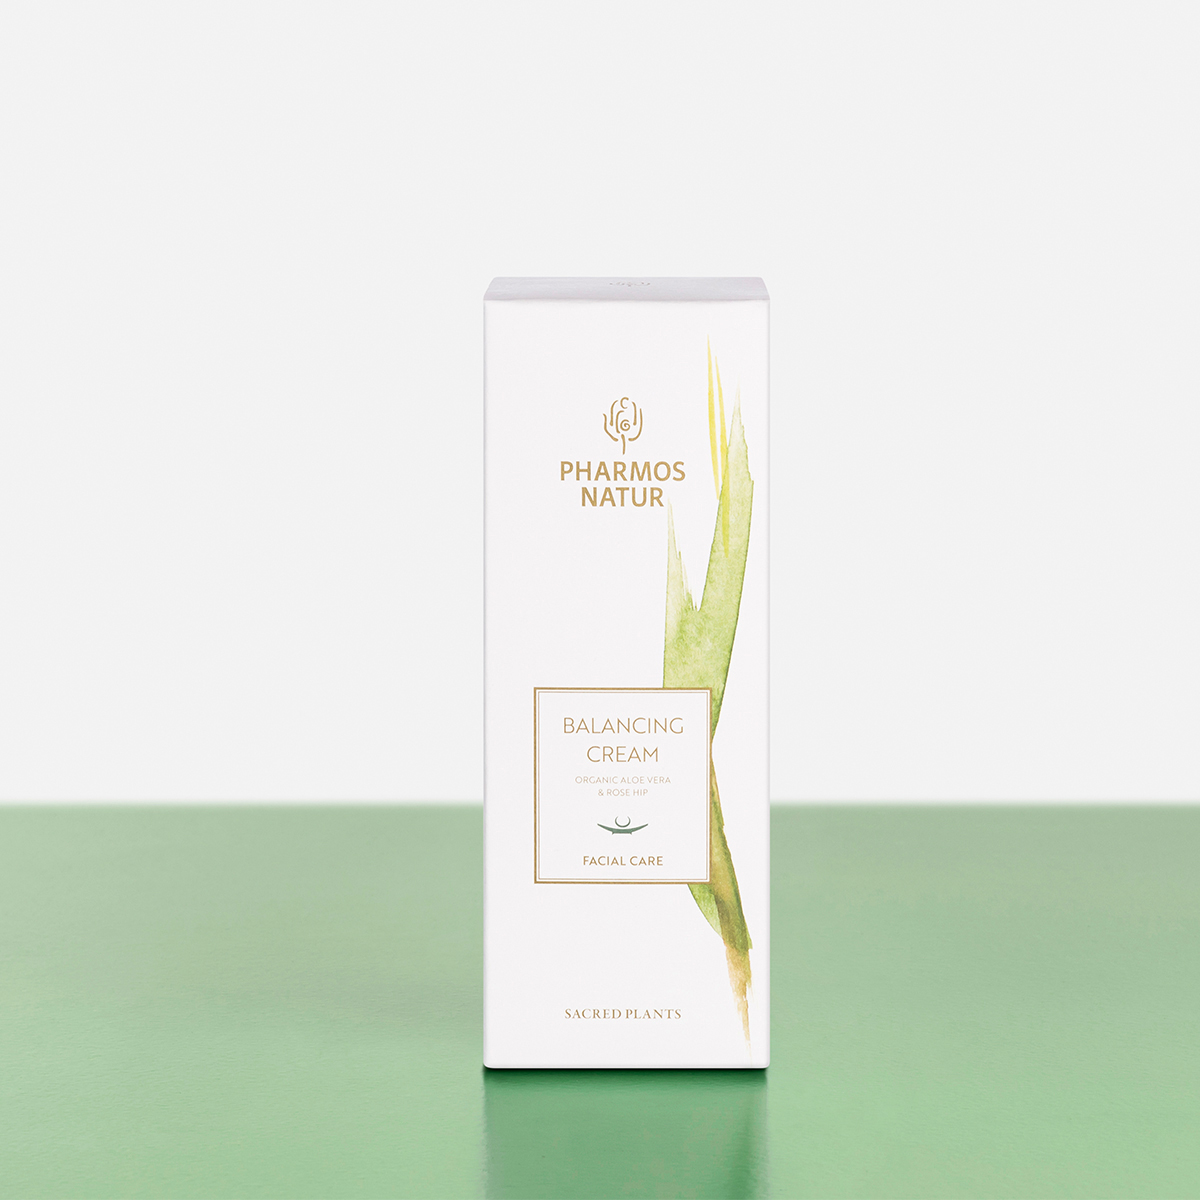 Verpackung Balancing Cream Produktbild